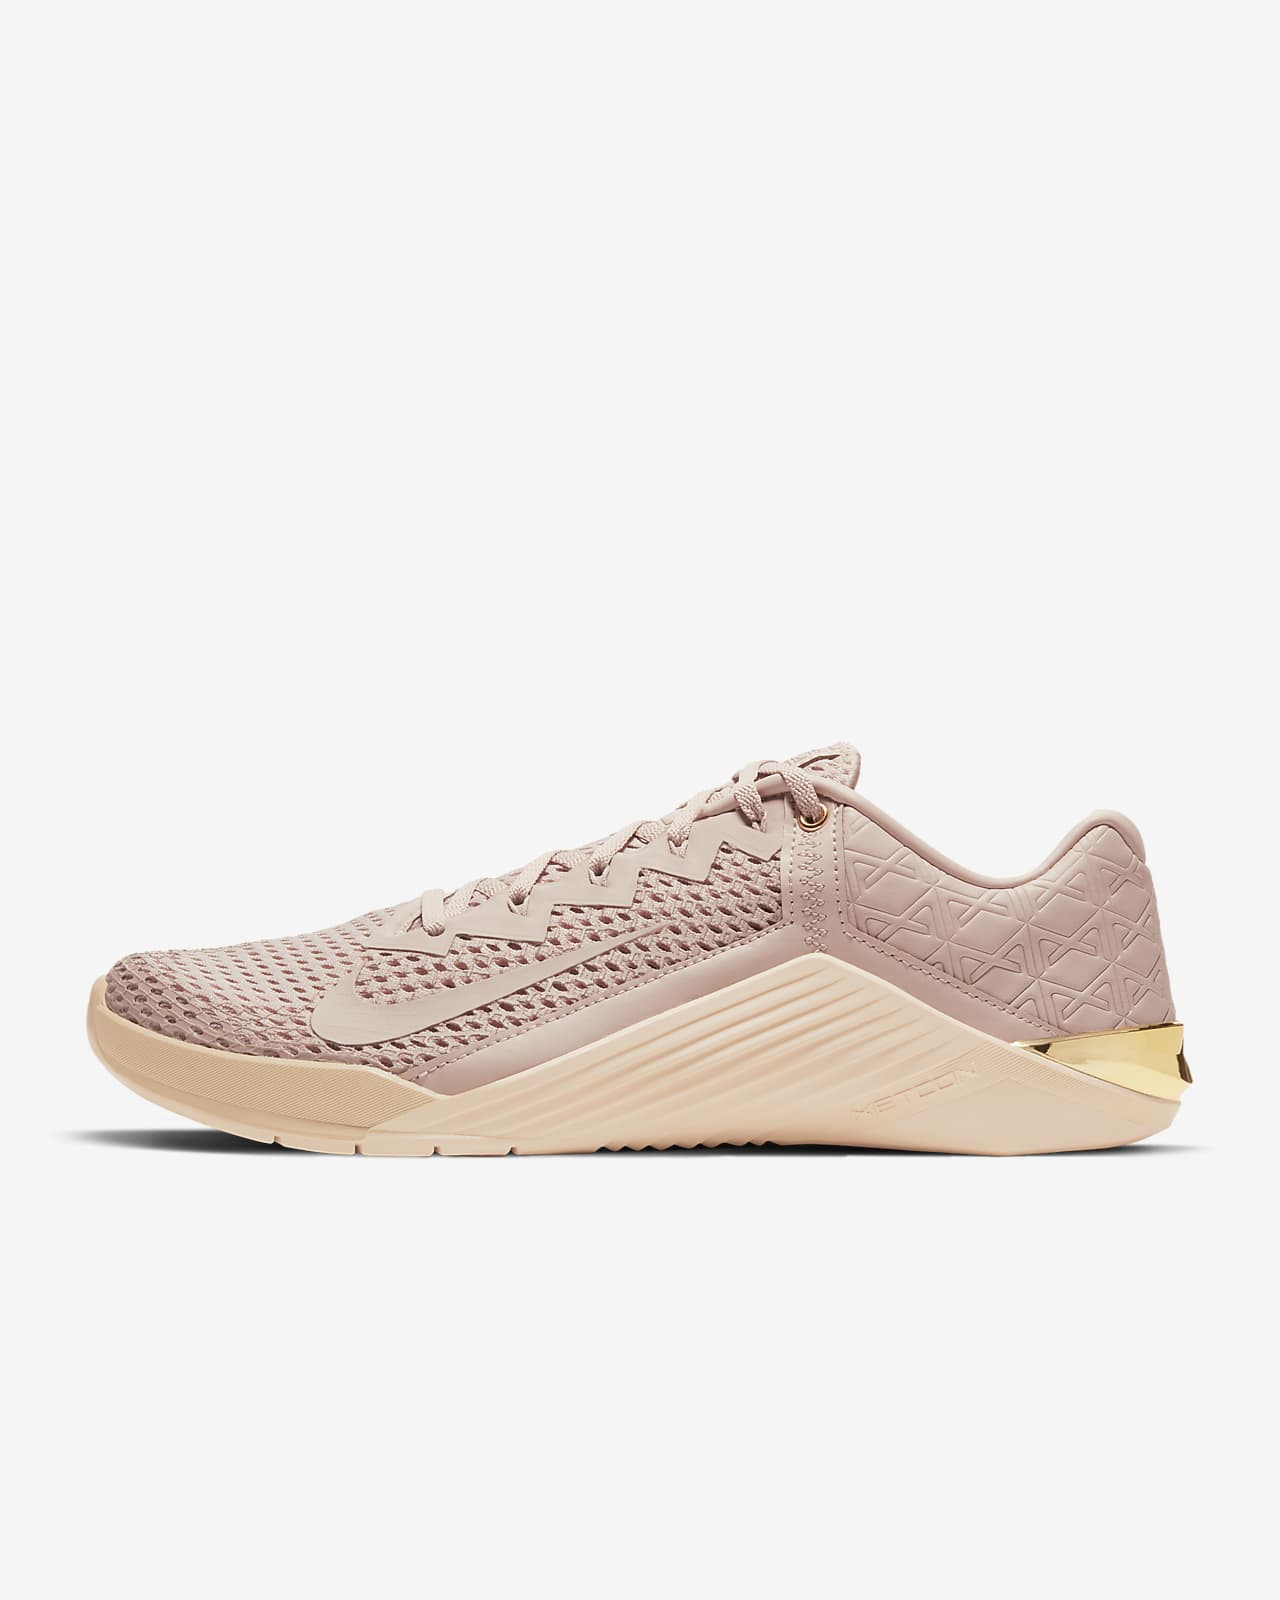 Chaussure de training Nike Metcon 6 Premium